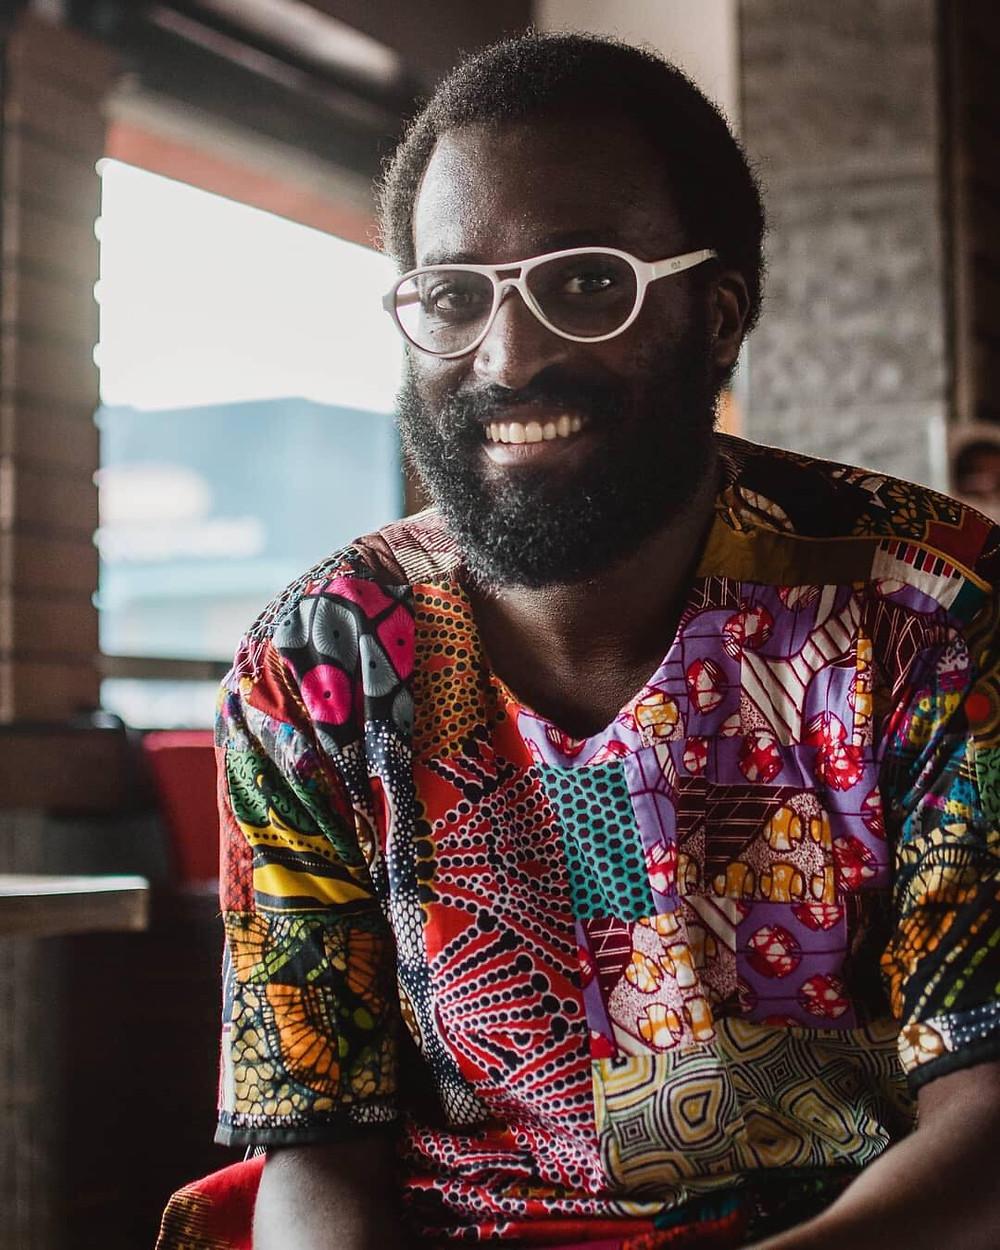 Feature writer and poet mugabi byenkya